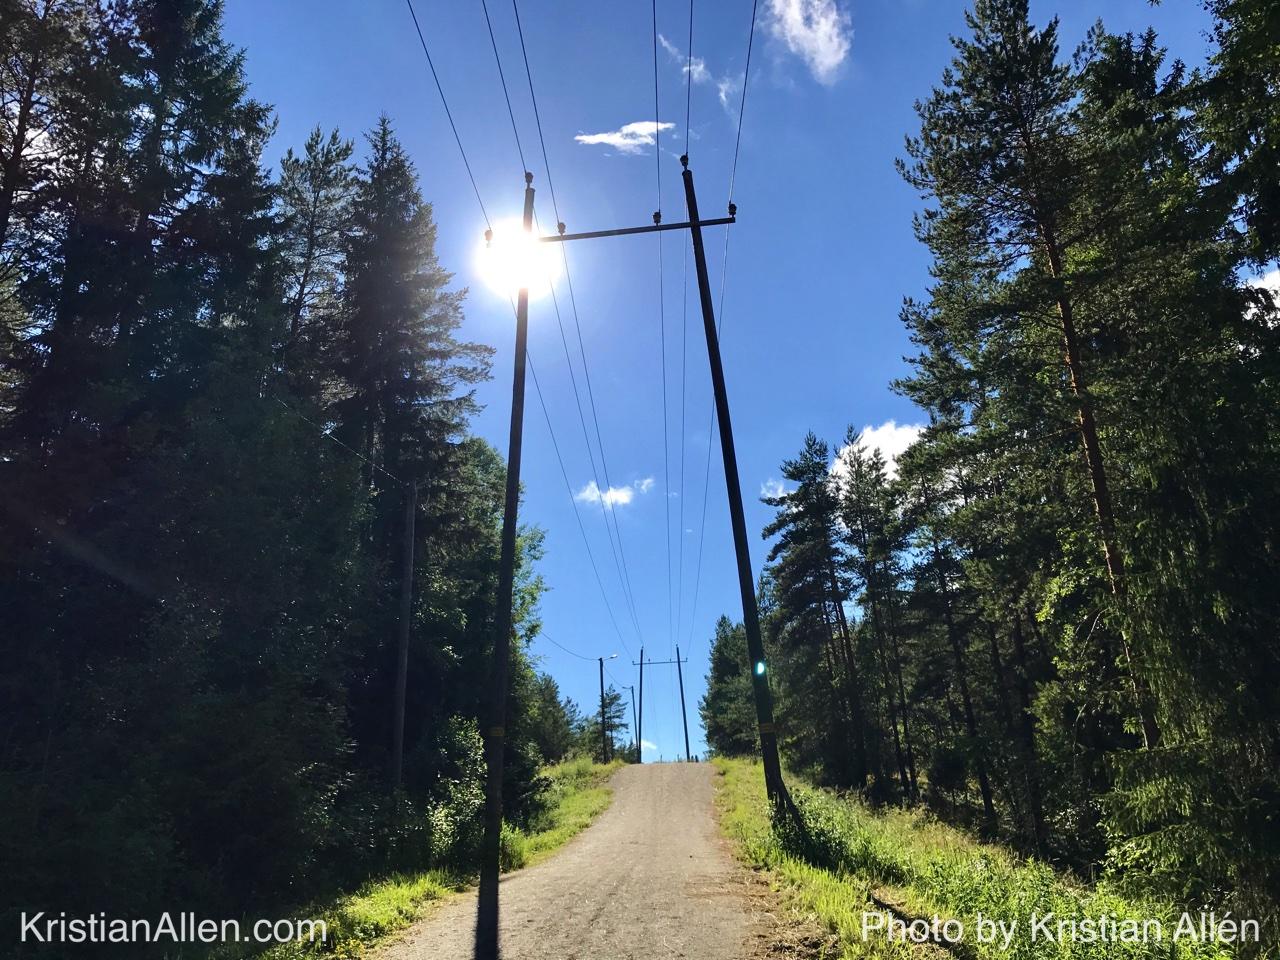 17.7.2017 16.18 km Run